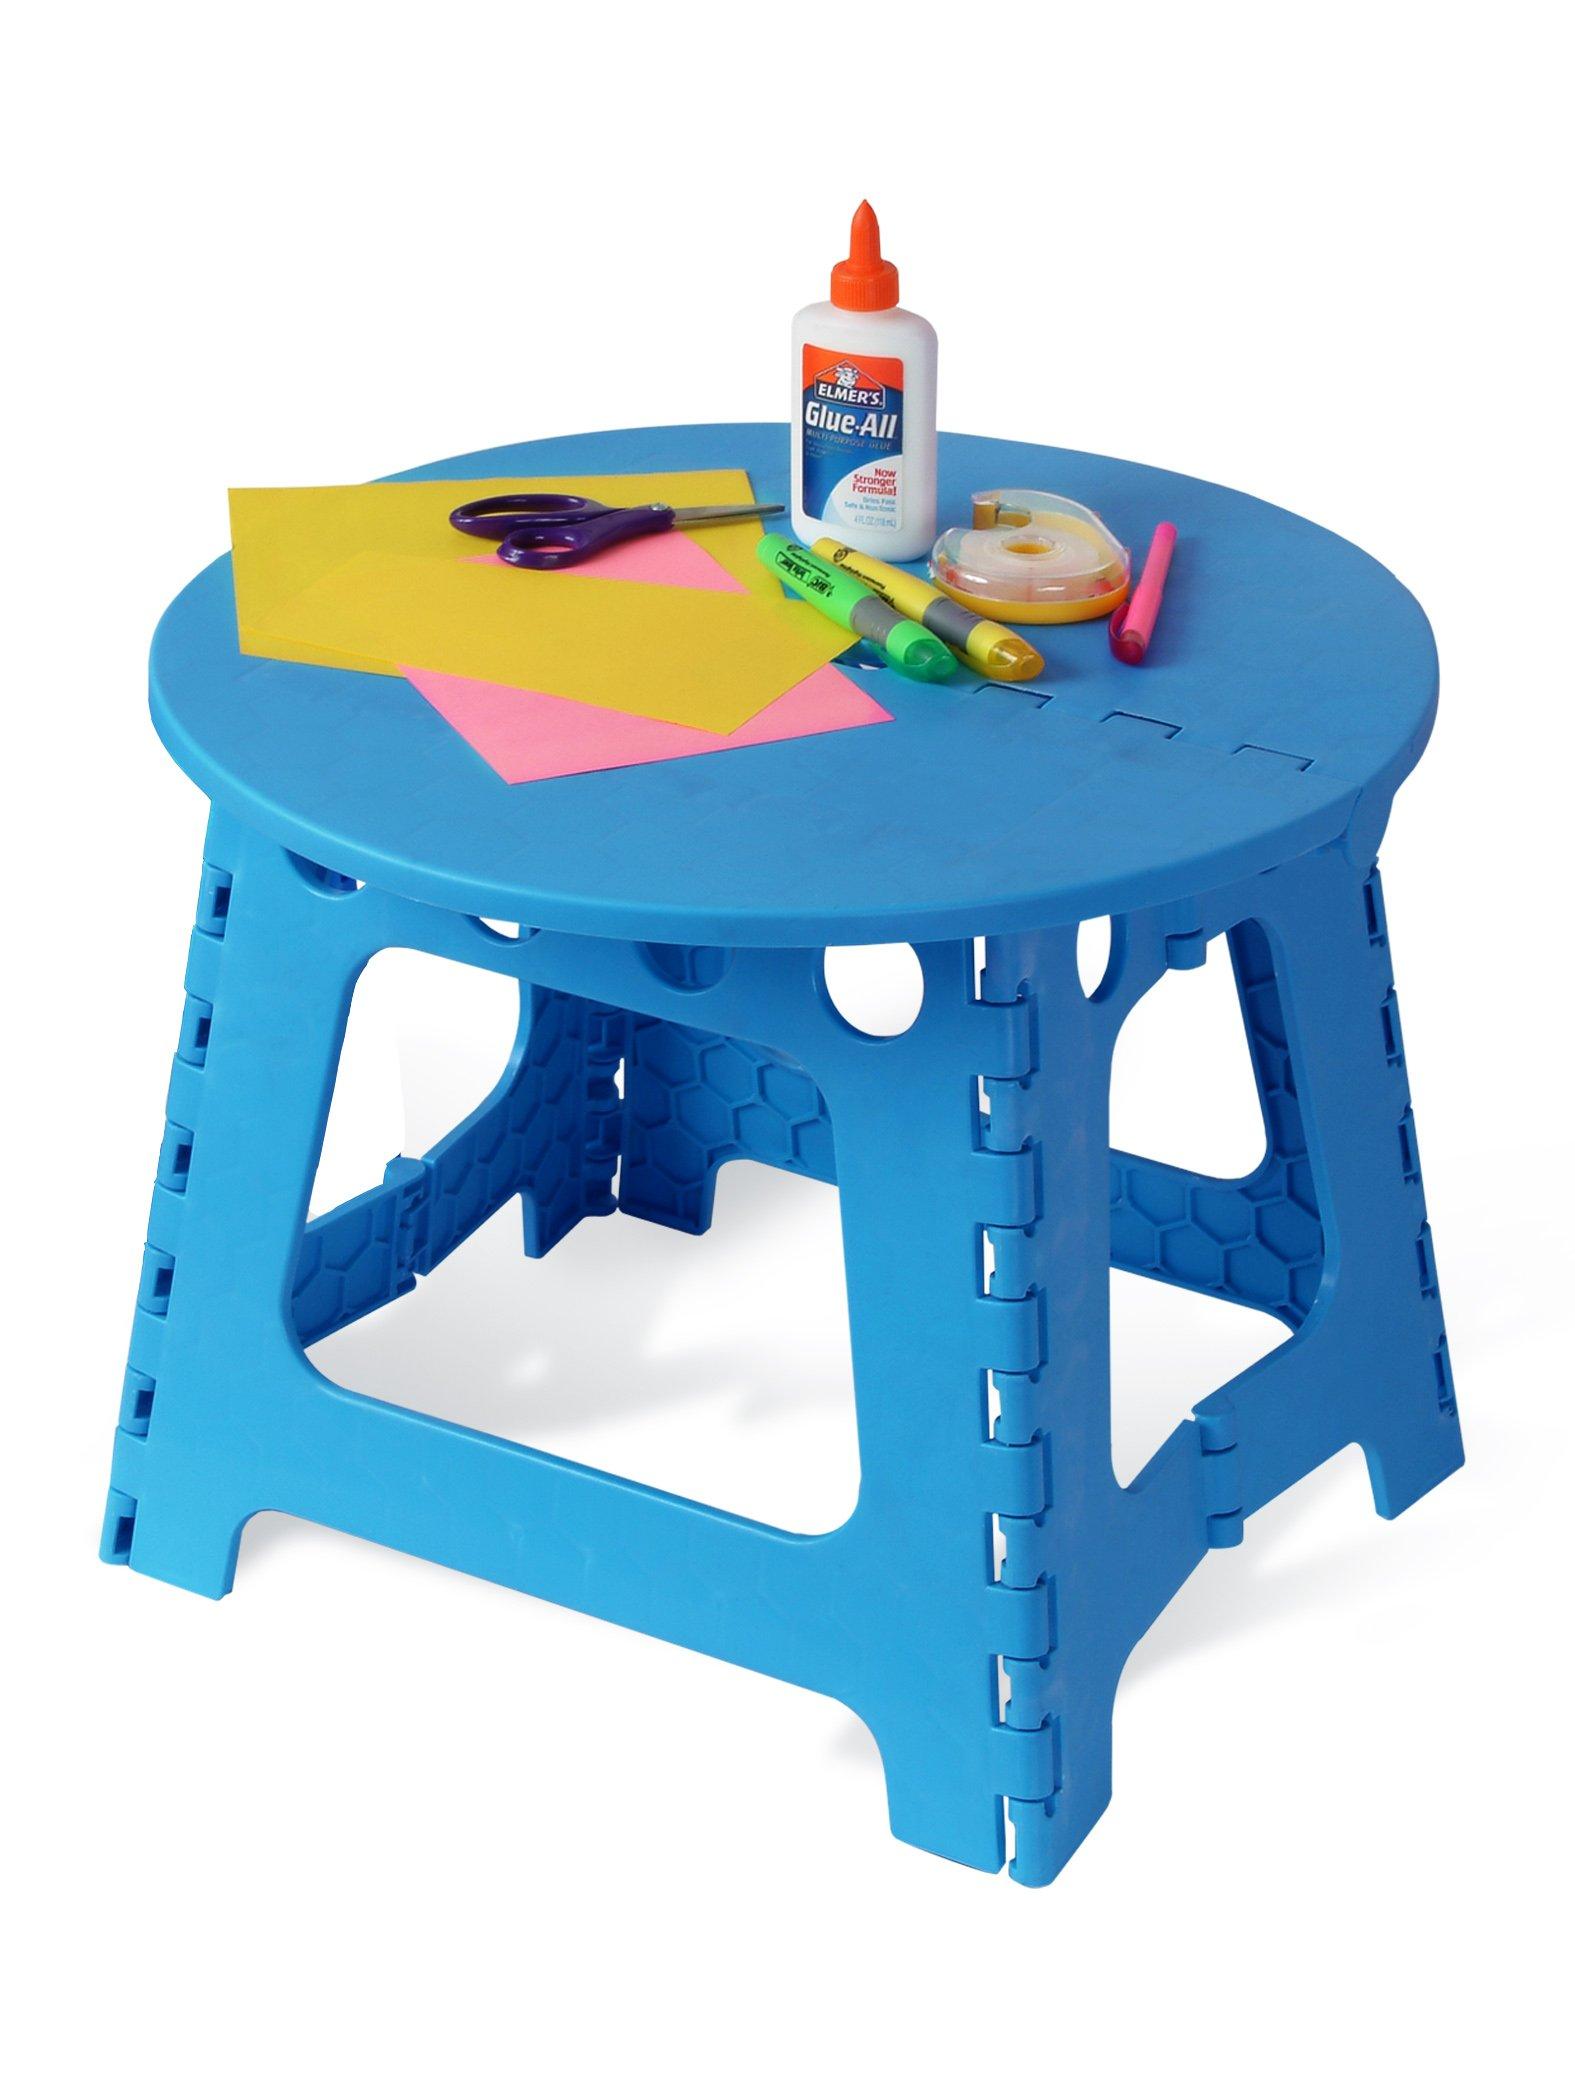 Superior Kids Folding Table Round (Blue)